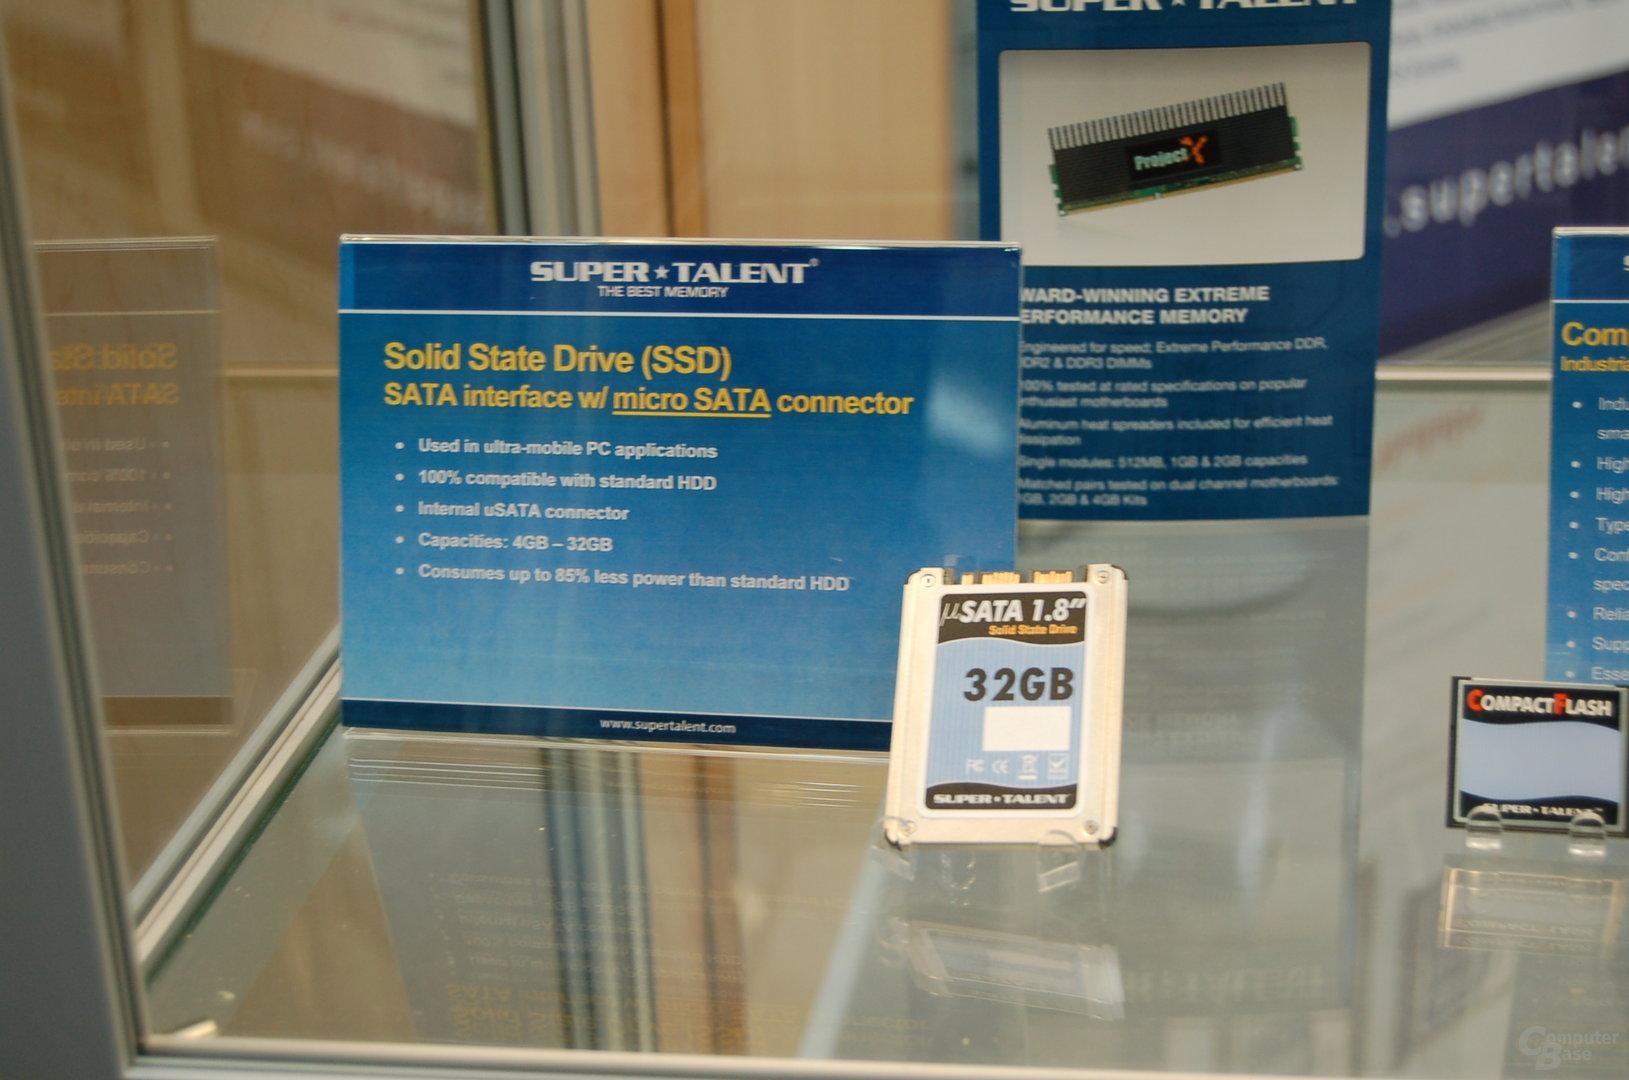 SSD mit micro-SATA-Anschluss